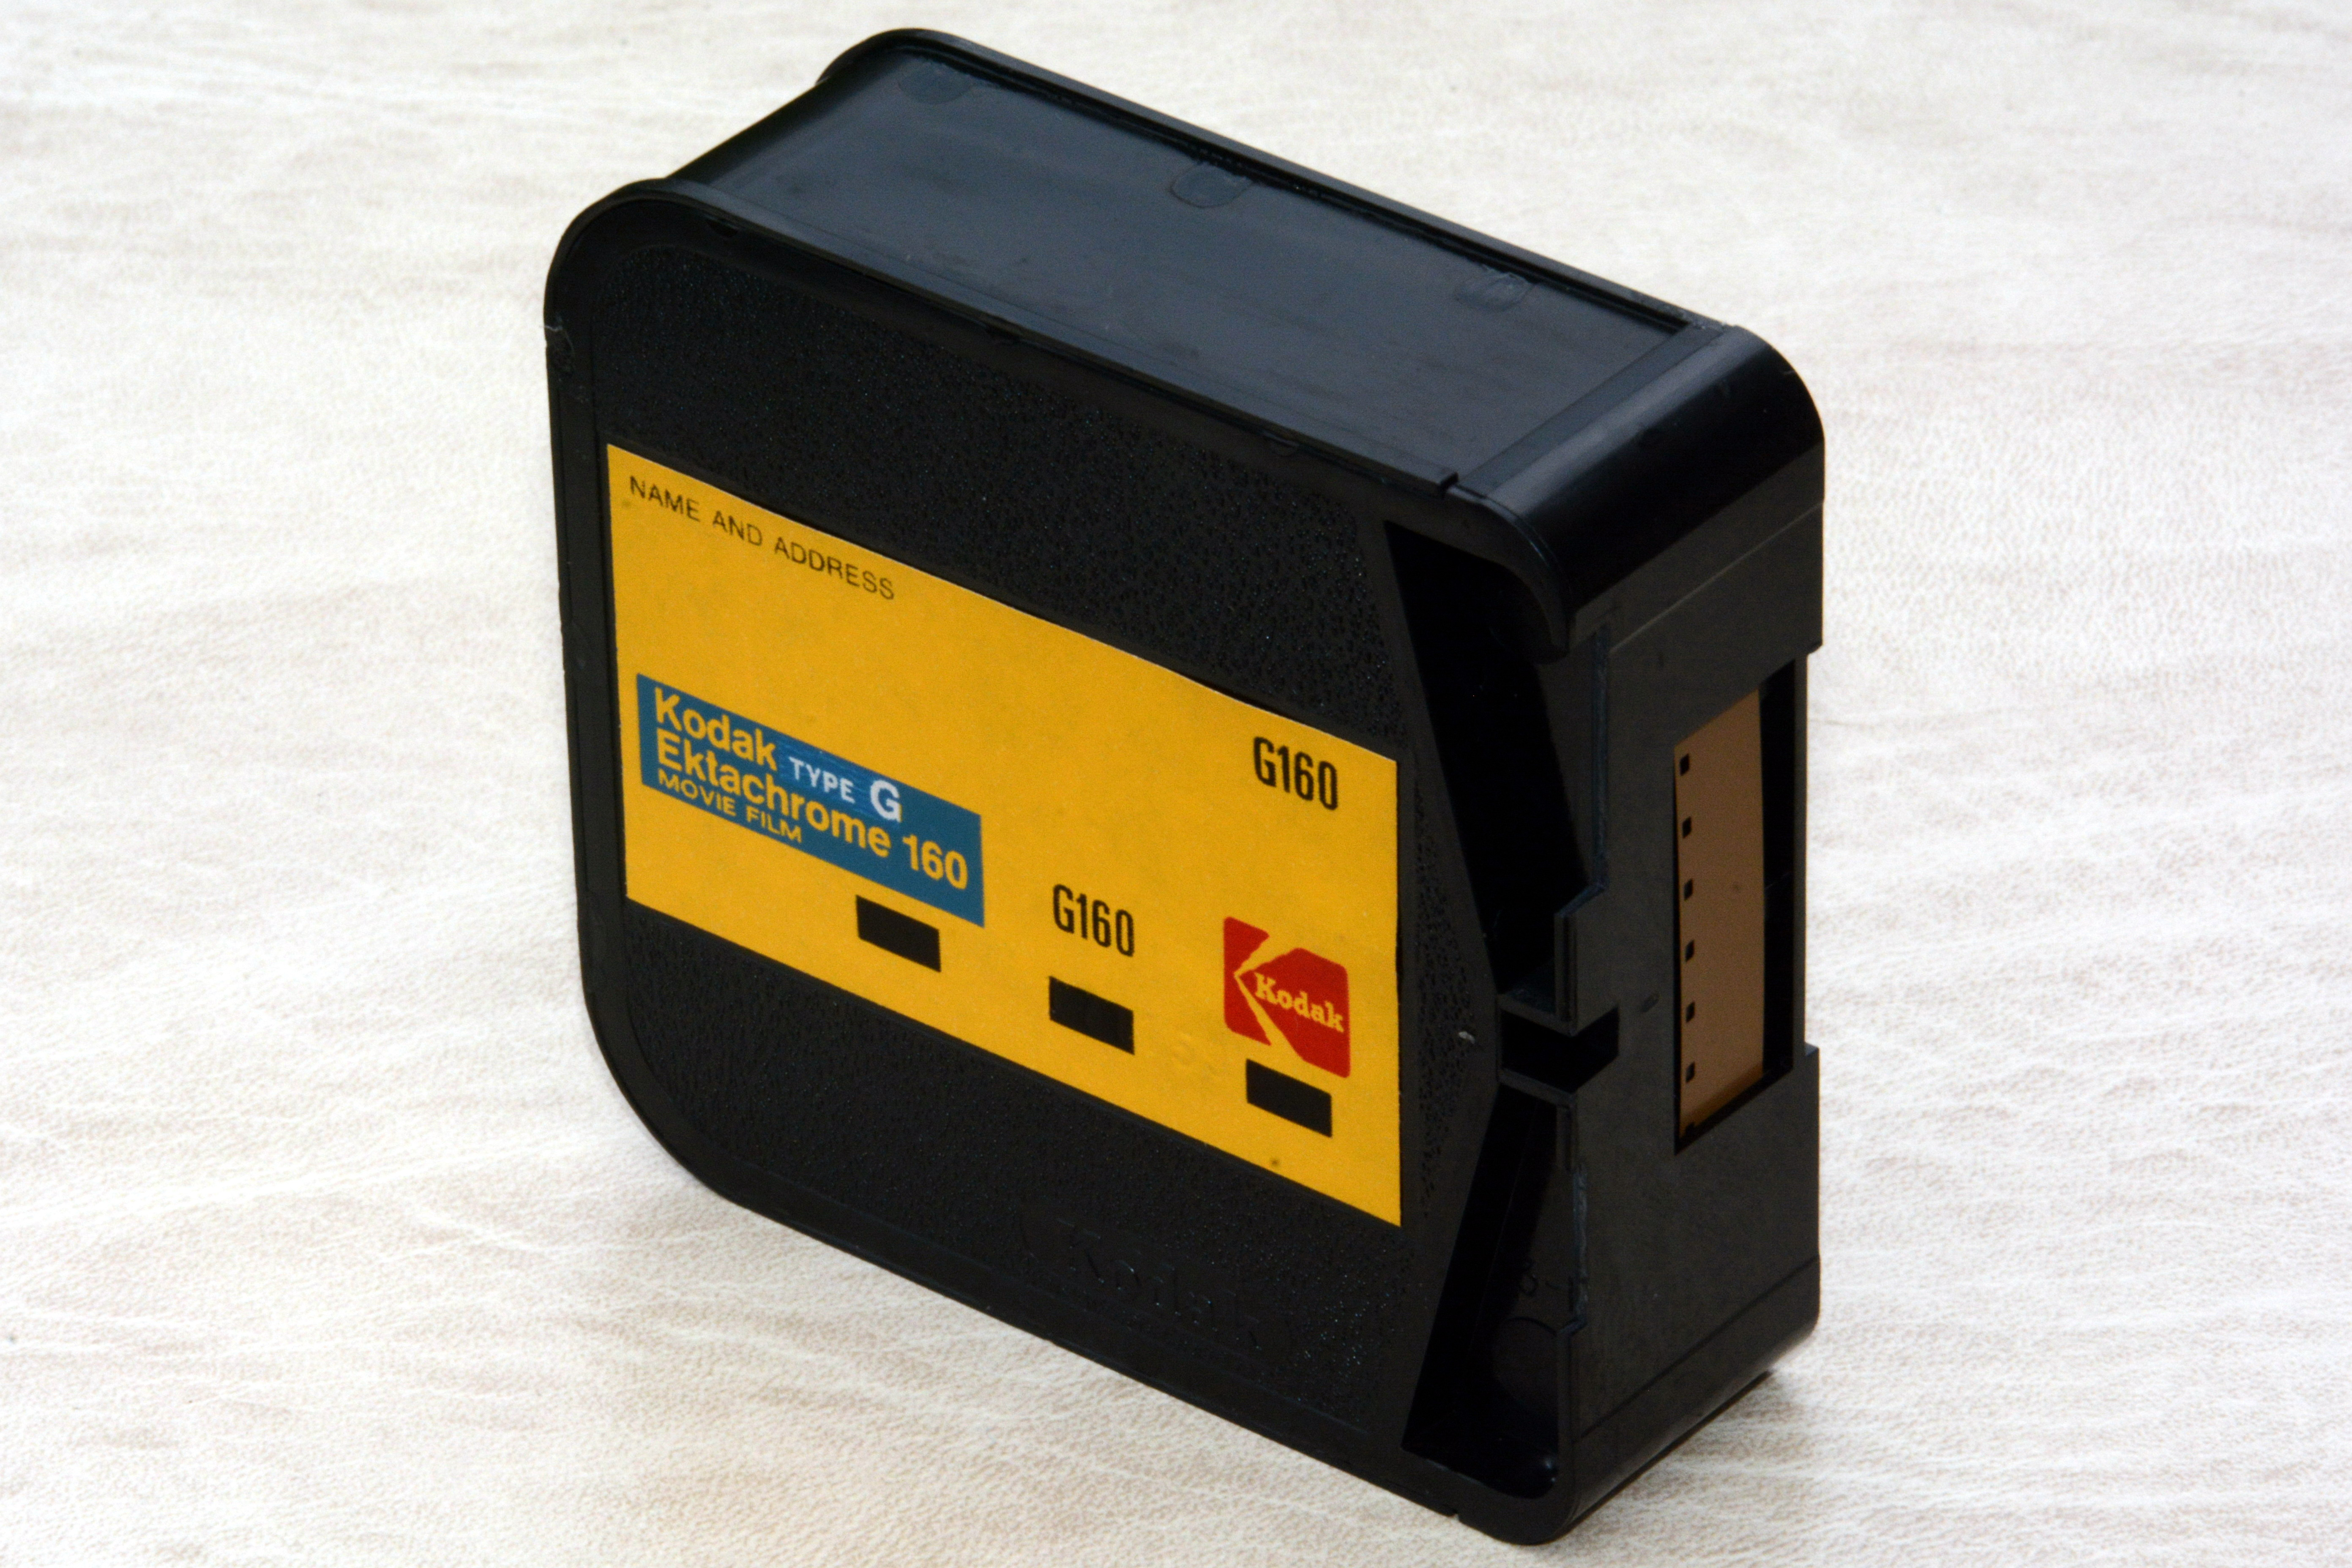 file kodak ektachrome 160 type g super 8 film cartridge wikimedia commons. Black Bedroom Furniture Sets. Home Design Ideas